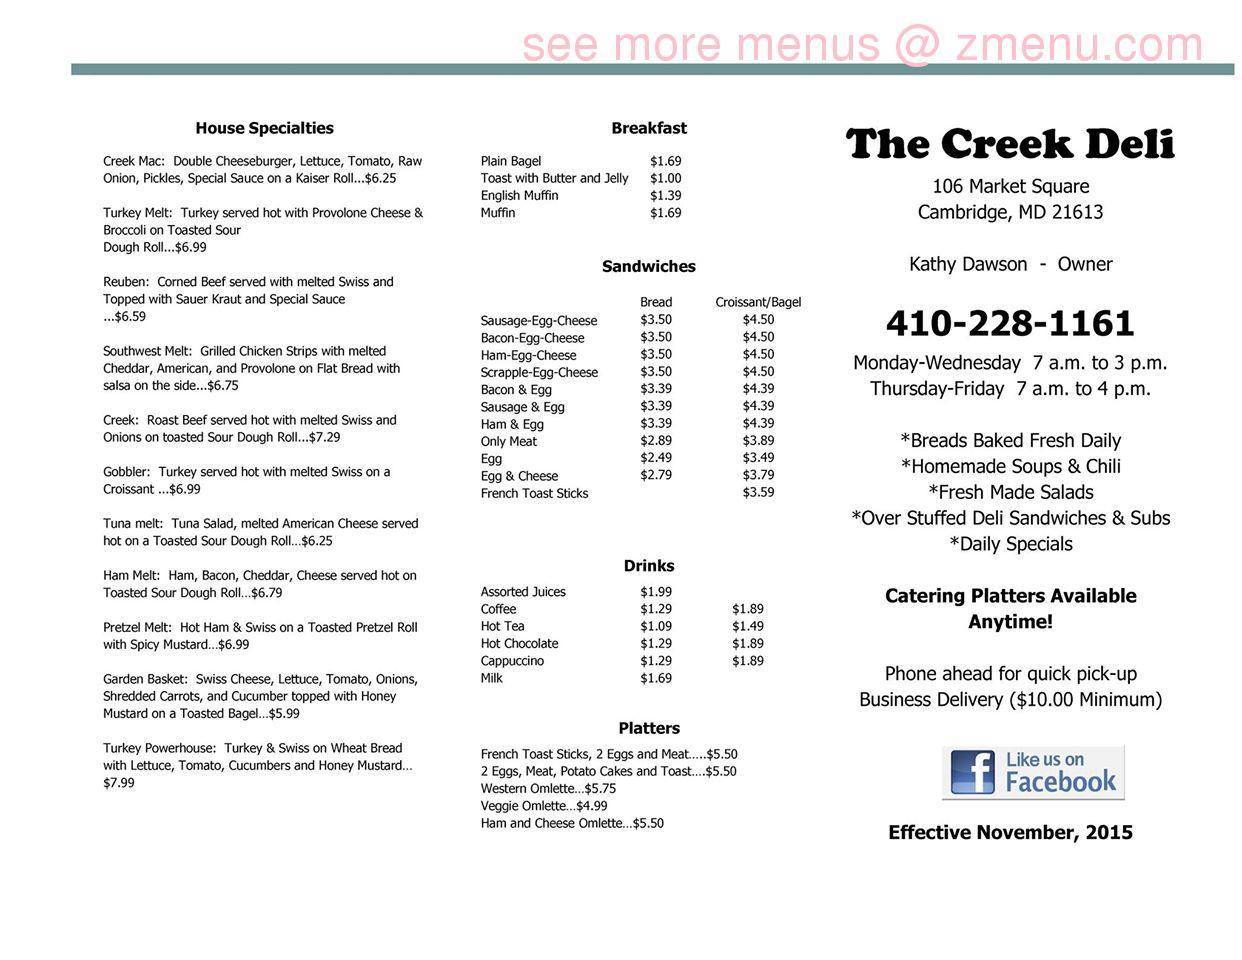 Online Menu of Creek Deli Restaurant, Cambridge, Maryland